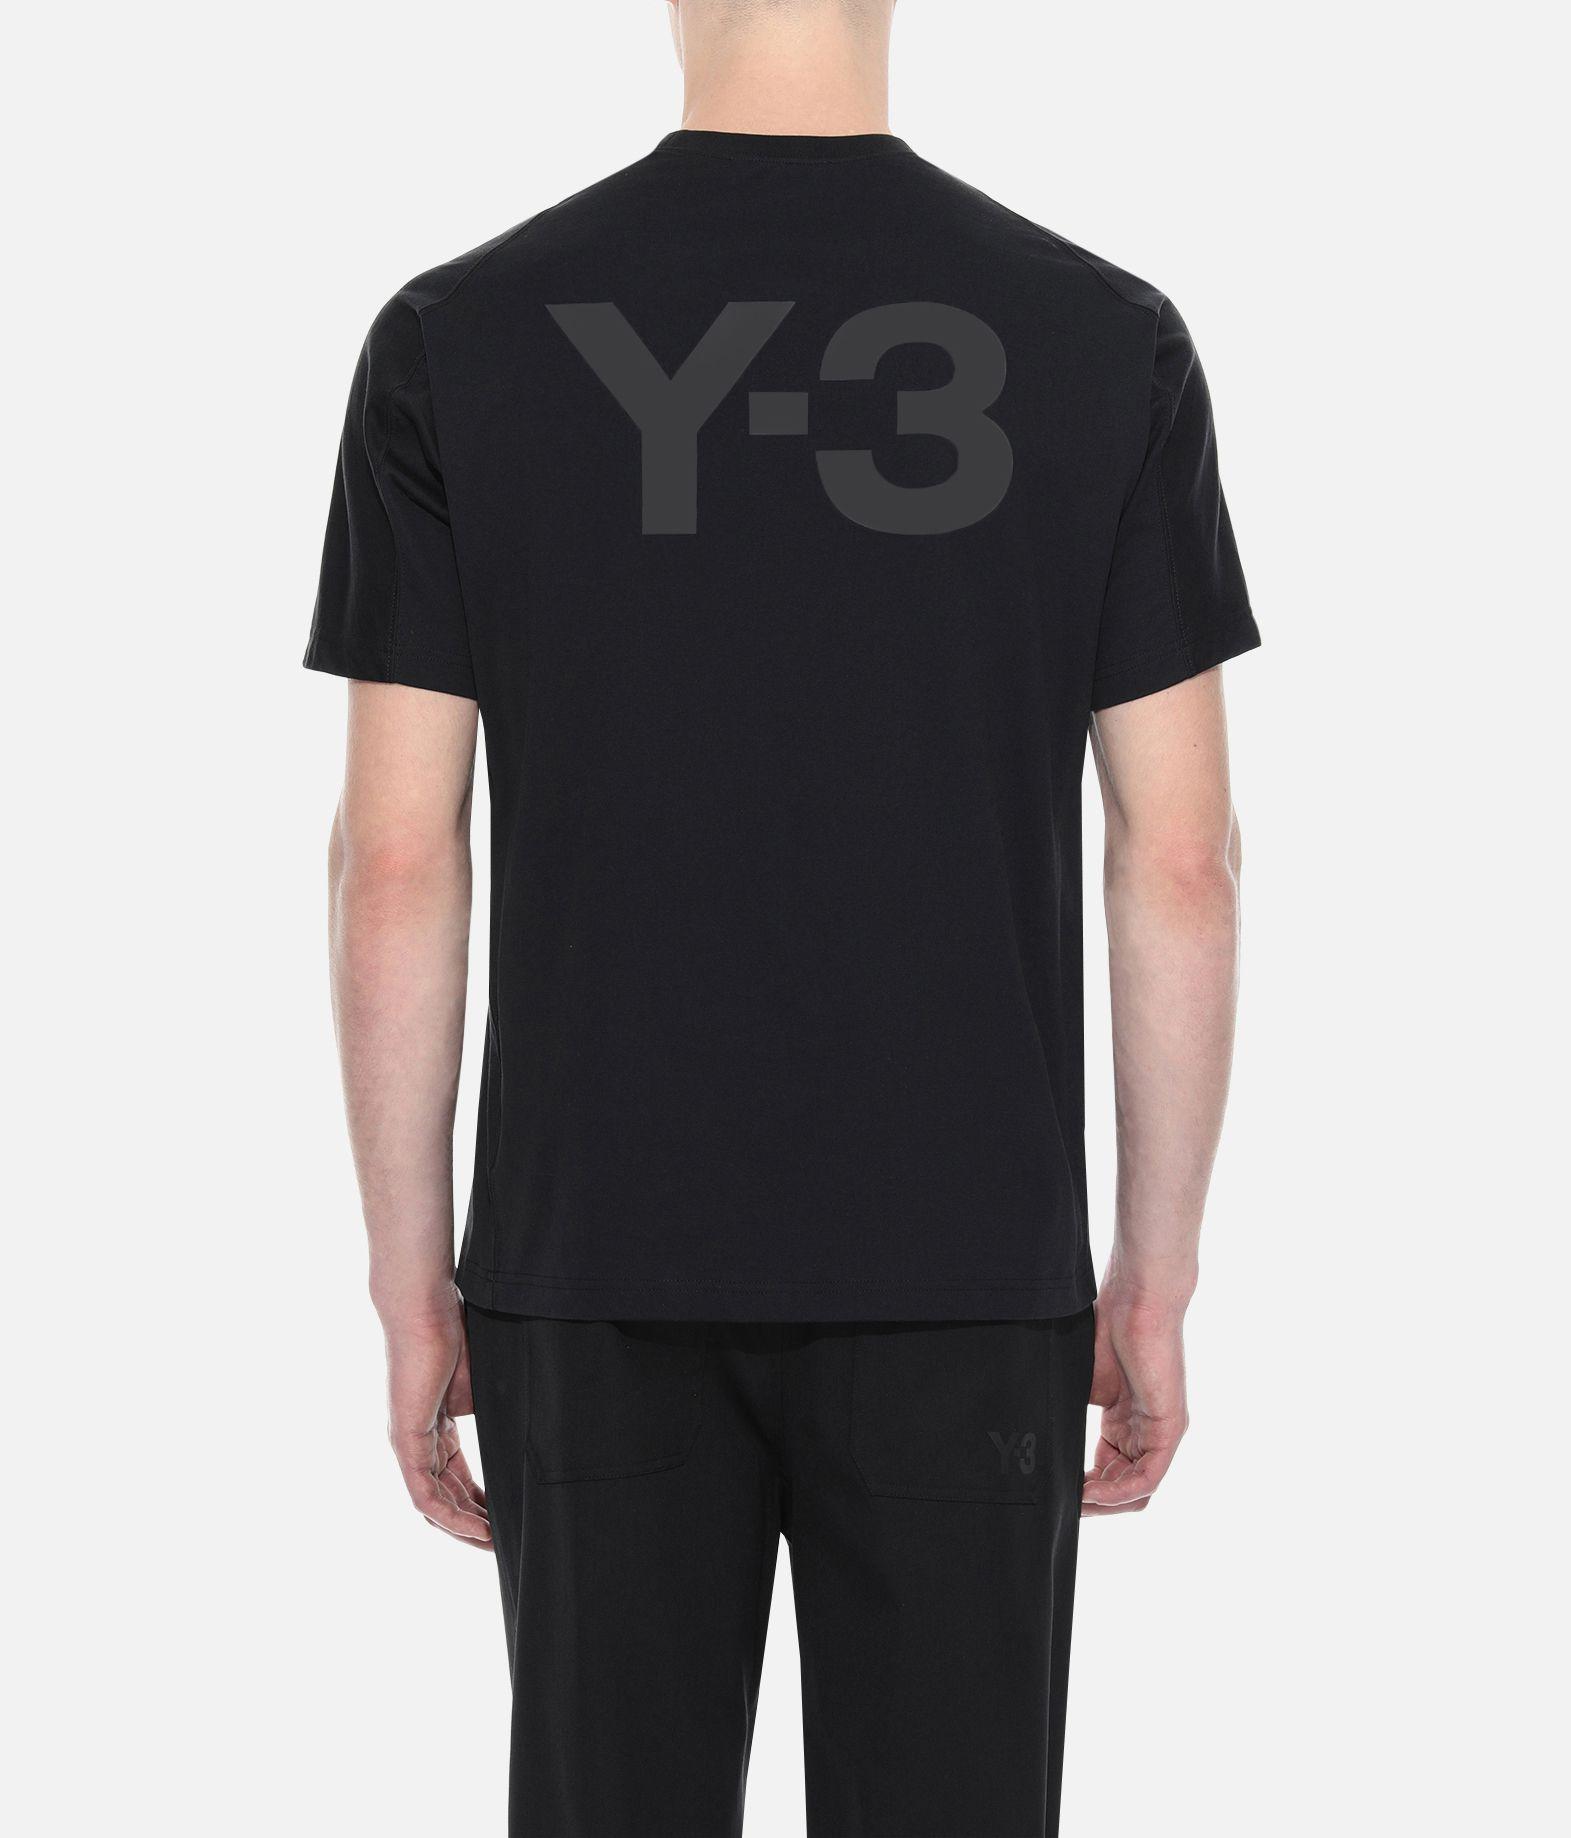 Y-3 Y-3 Classic Crewneck Tee Short sleeve t-shirt Man d